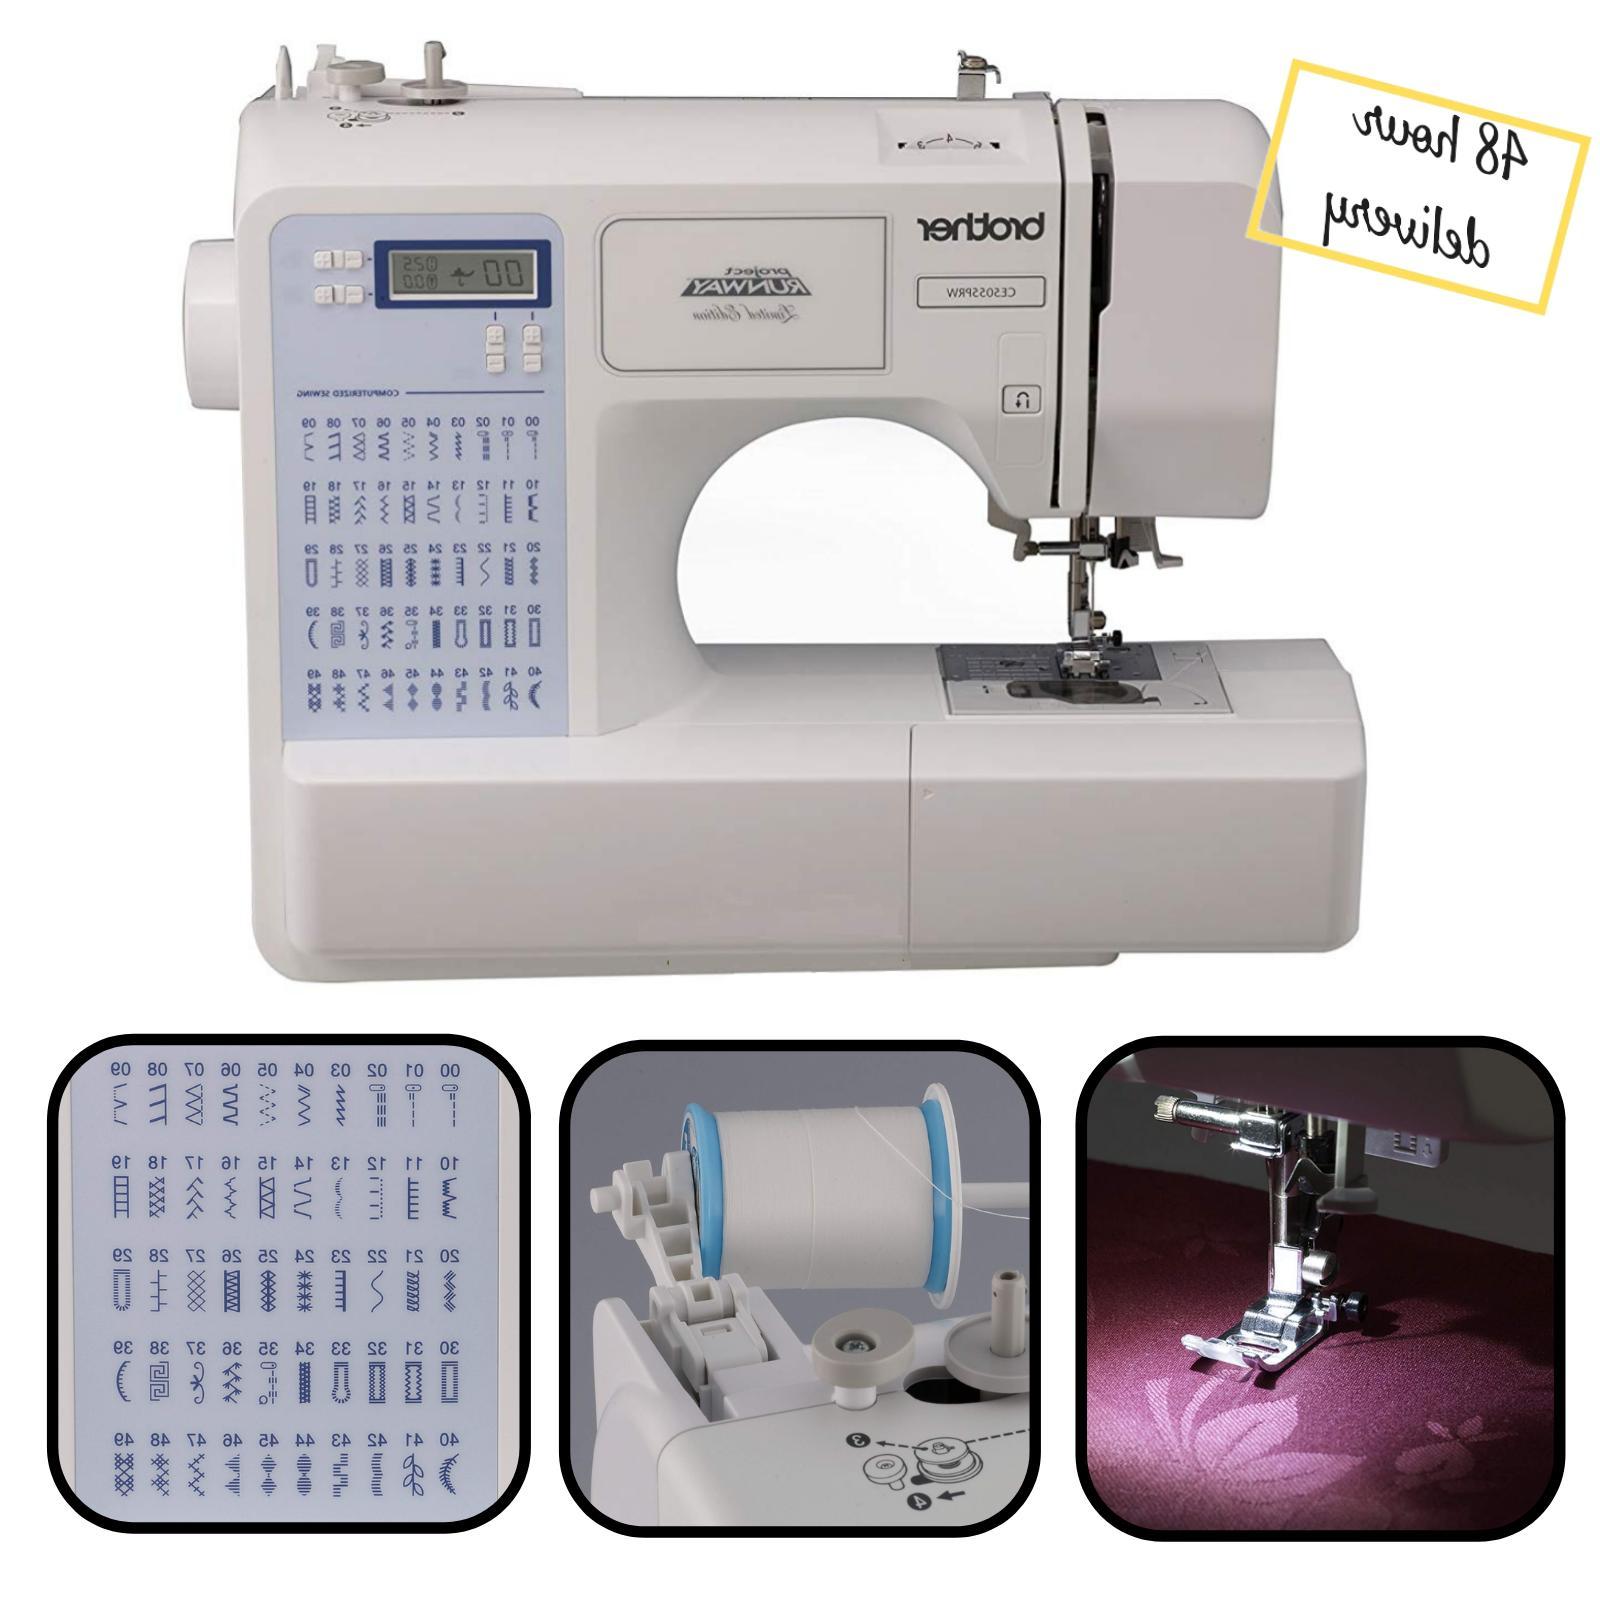 computerized sewing machine 50 stitch runway electric